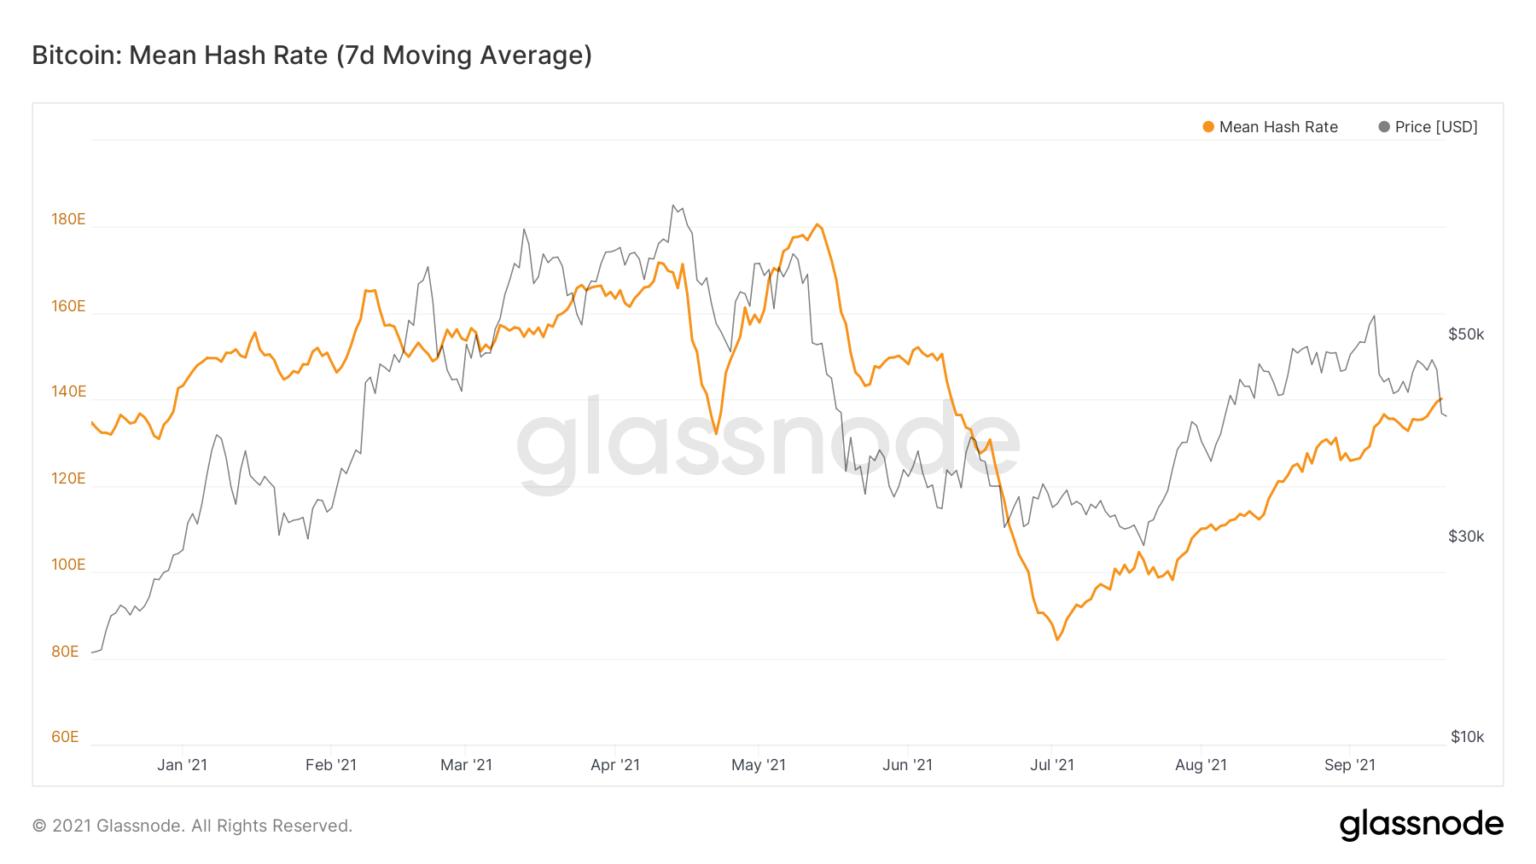 1glassnode-studio_bitcoin-mean-hash-rate-7-d-moving-average-2-1536x864.png (172 KB)